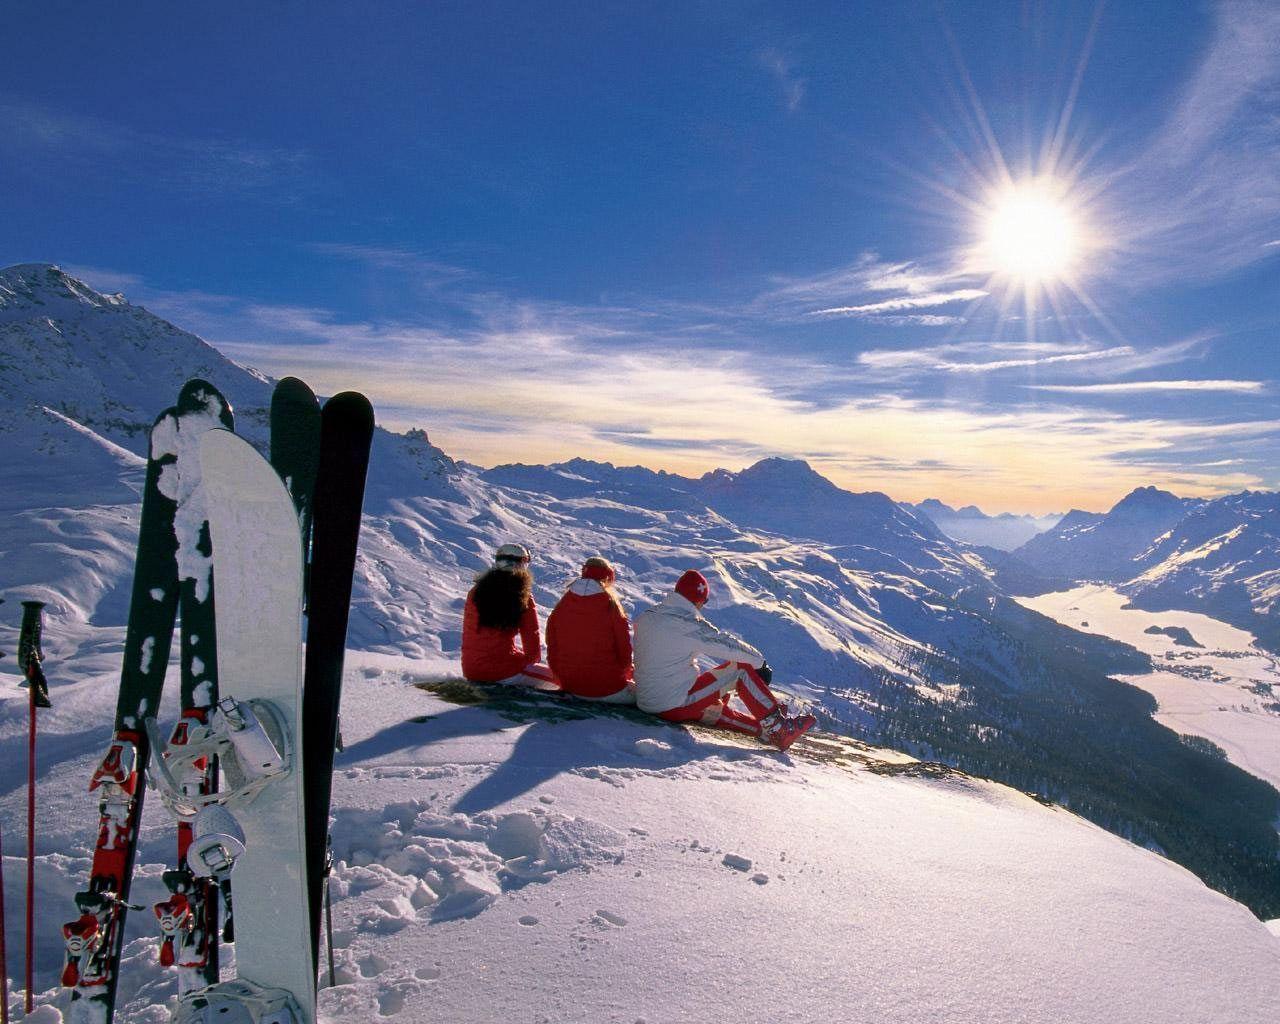 Snowboarding Desktop Backgrounds Wallpaper Cave